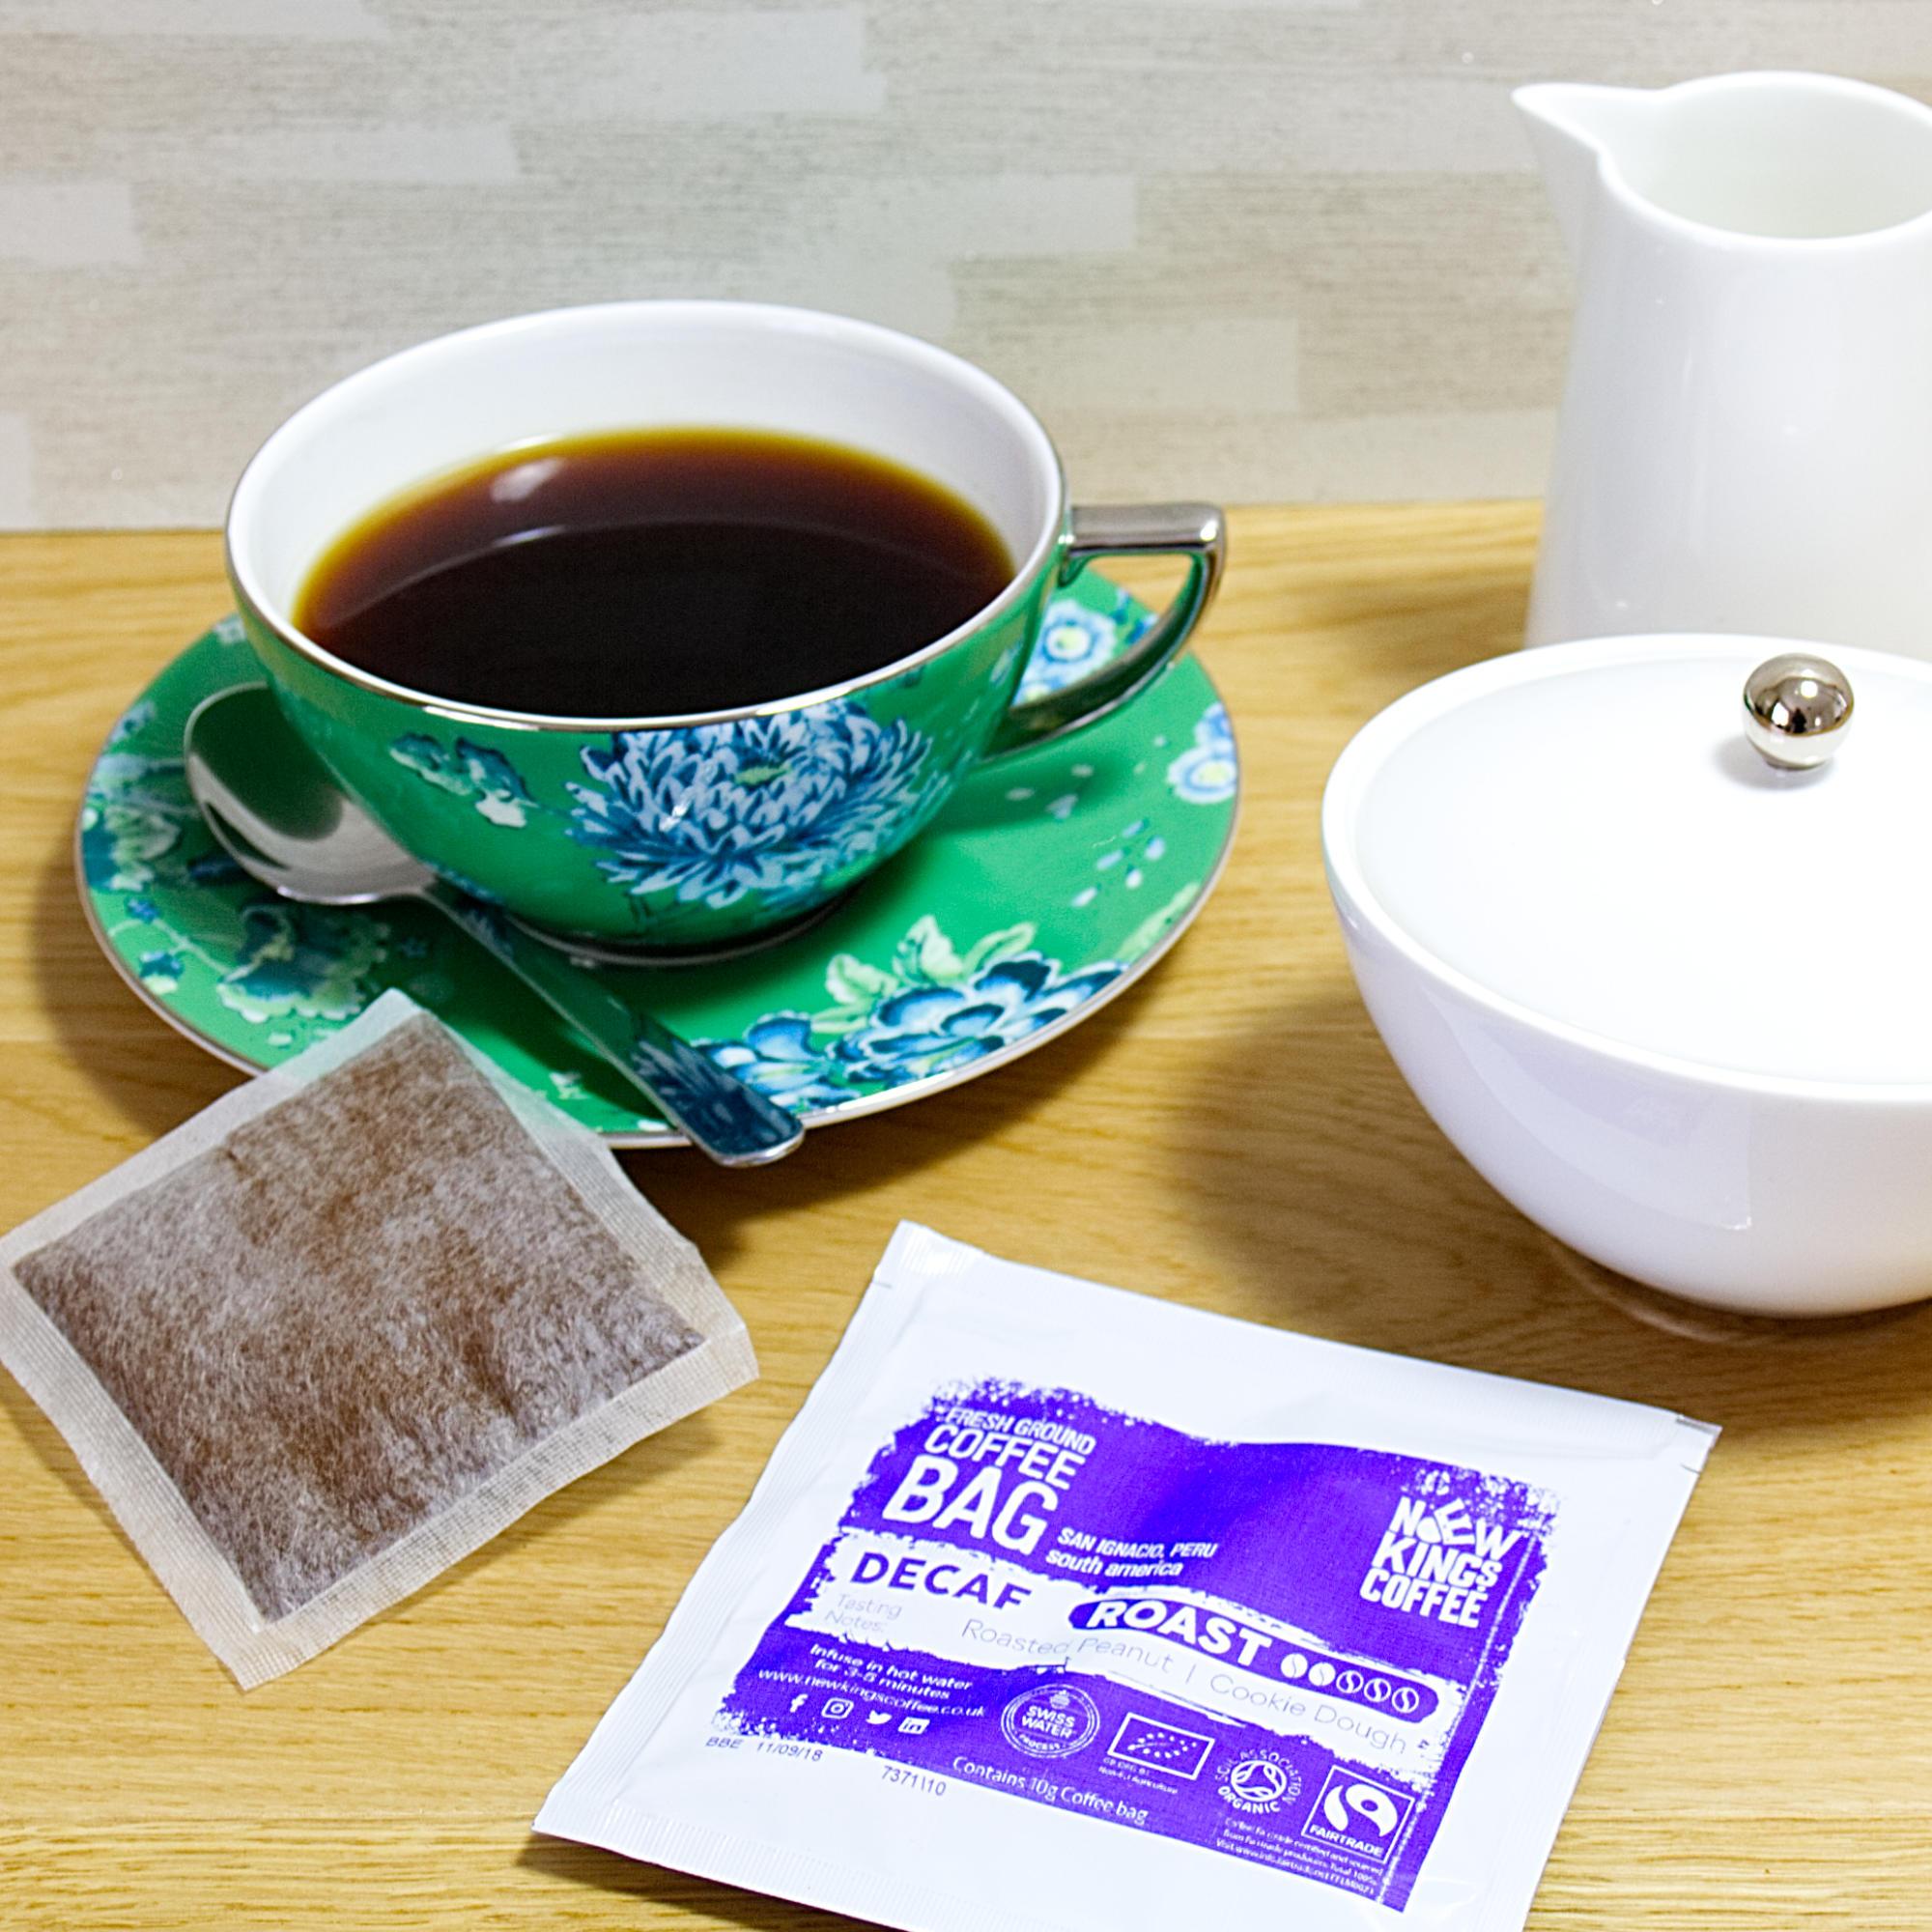 New-Kings-Coffee-Bags-Fairtrade-Organic-Peru-with-milk-and-sugar-square.jpg